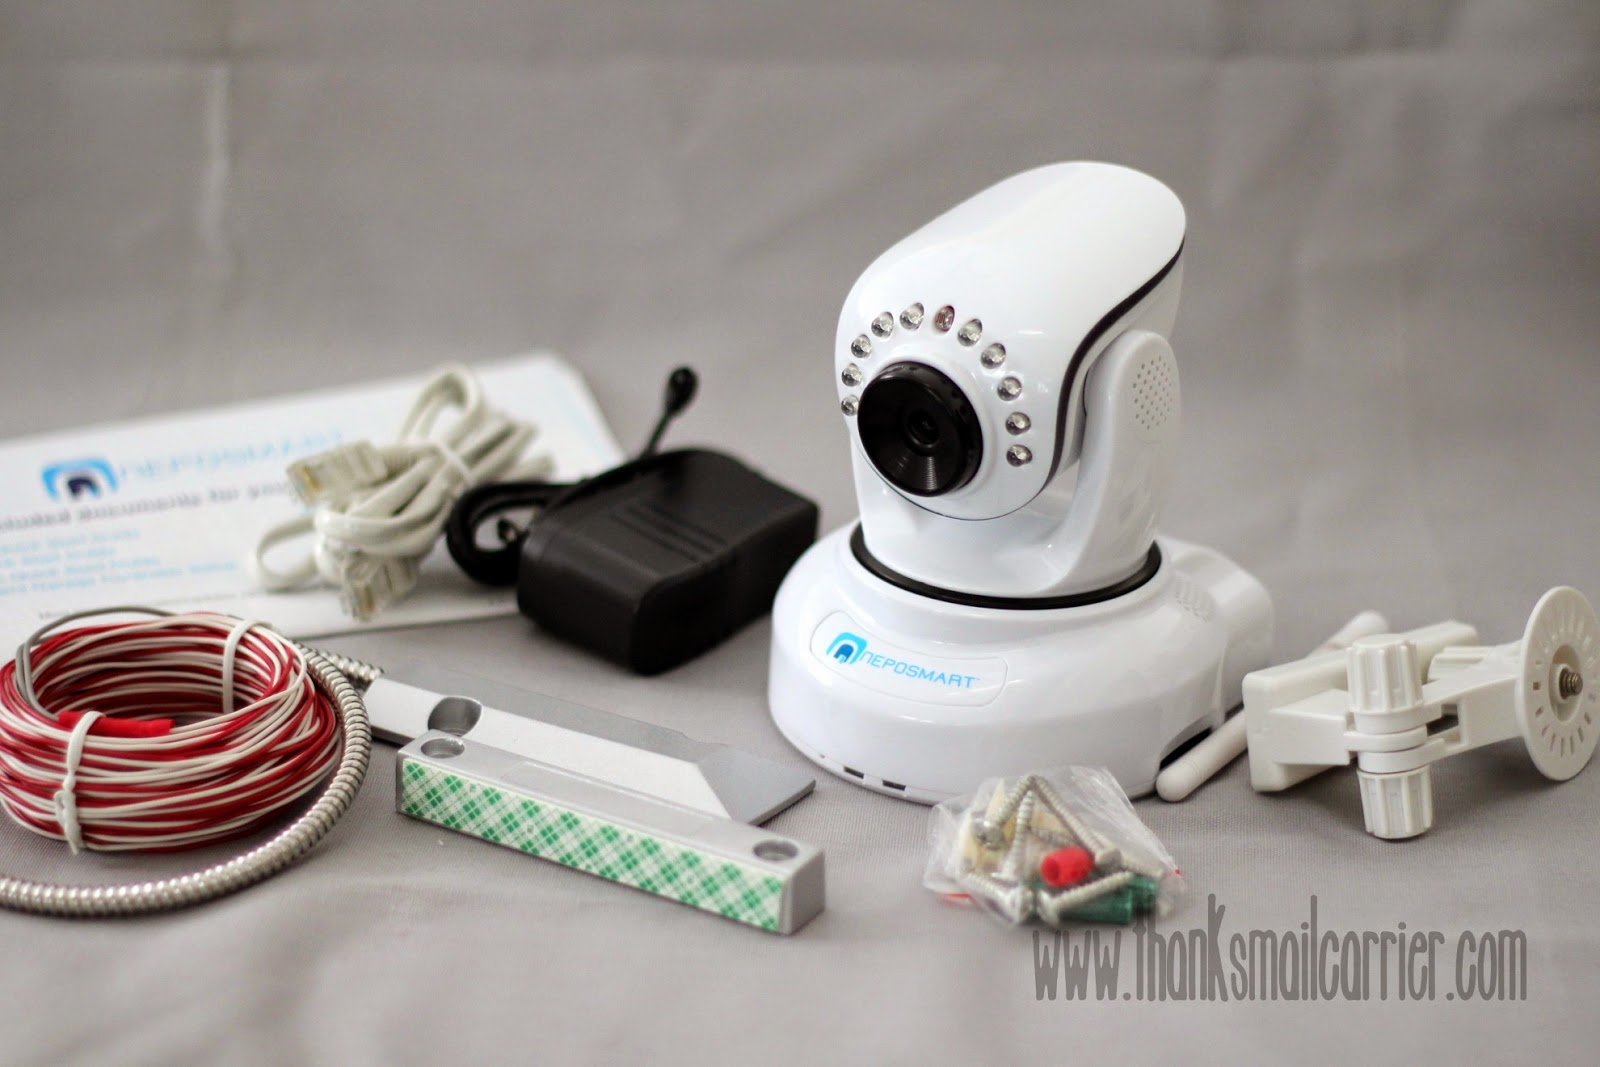 Neposmart security camera